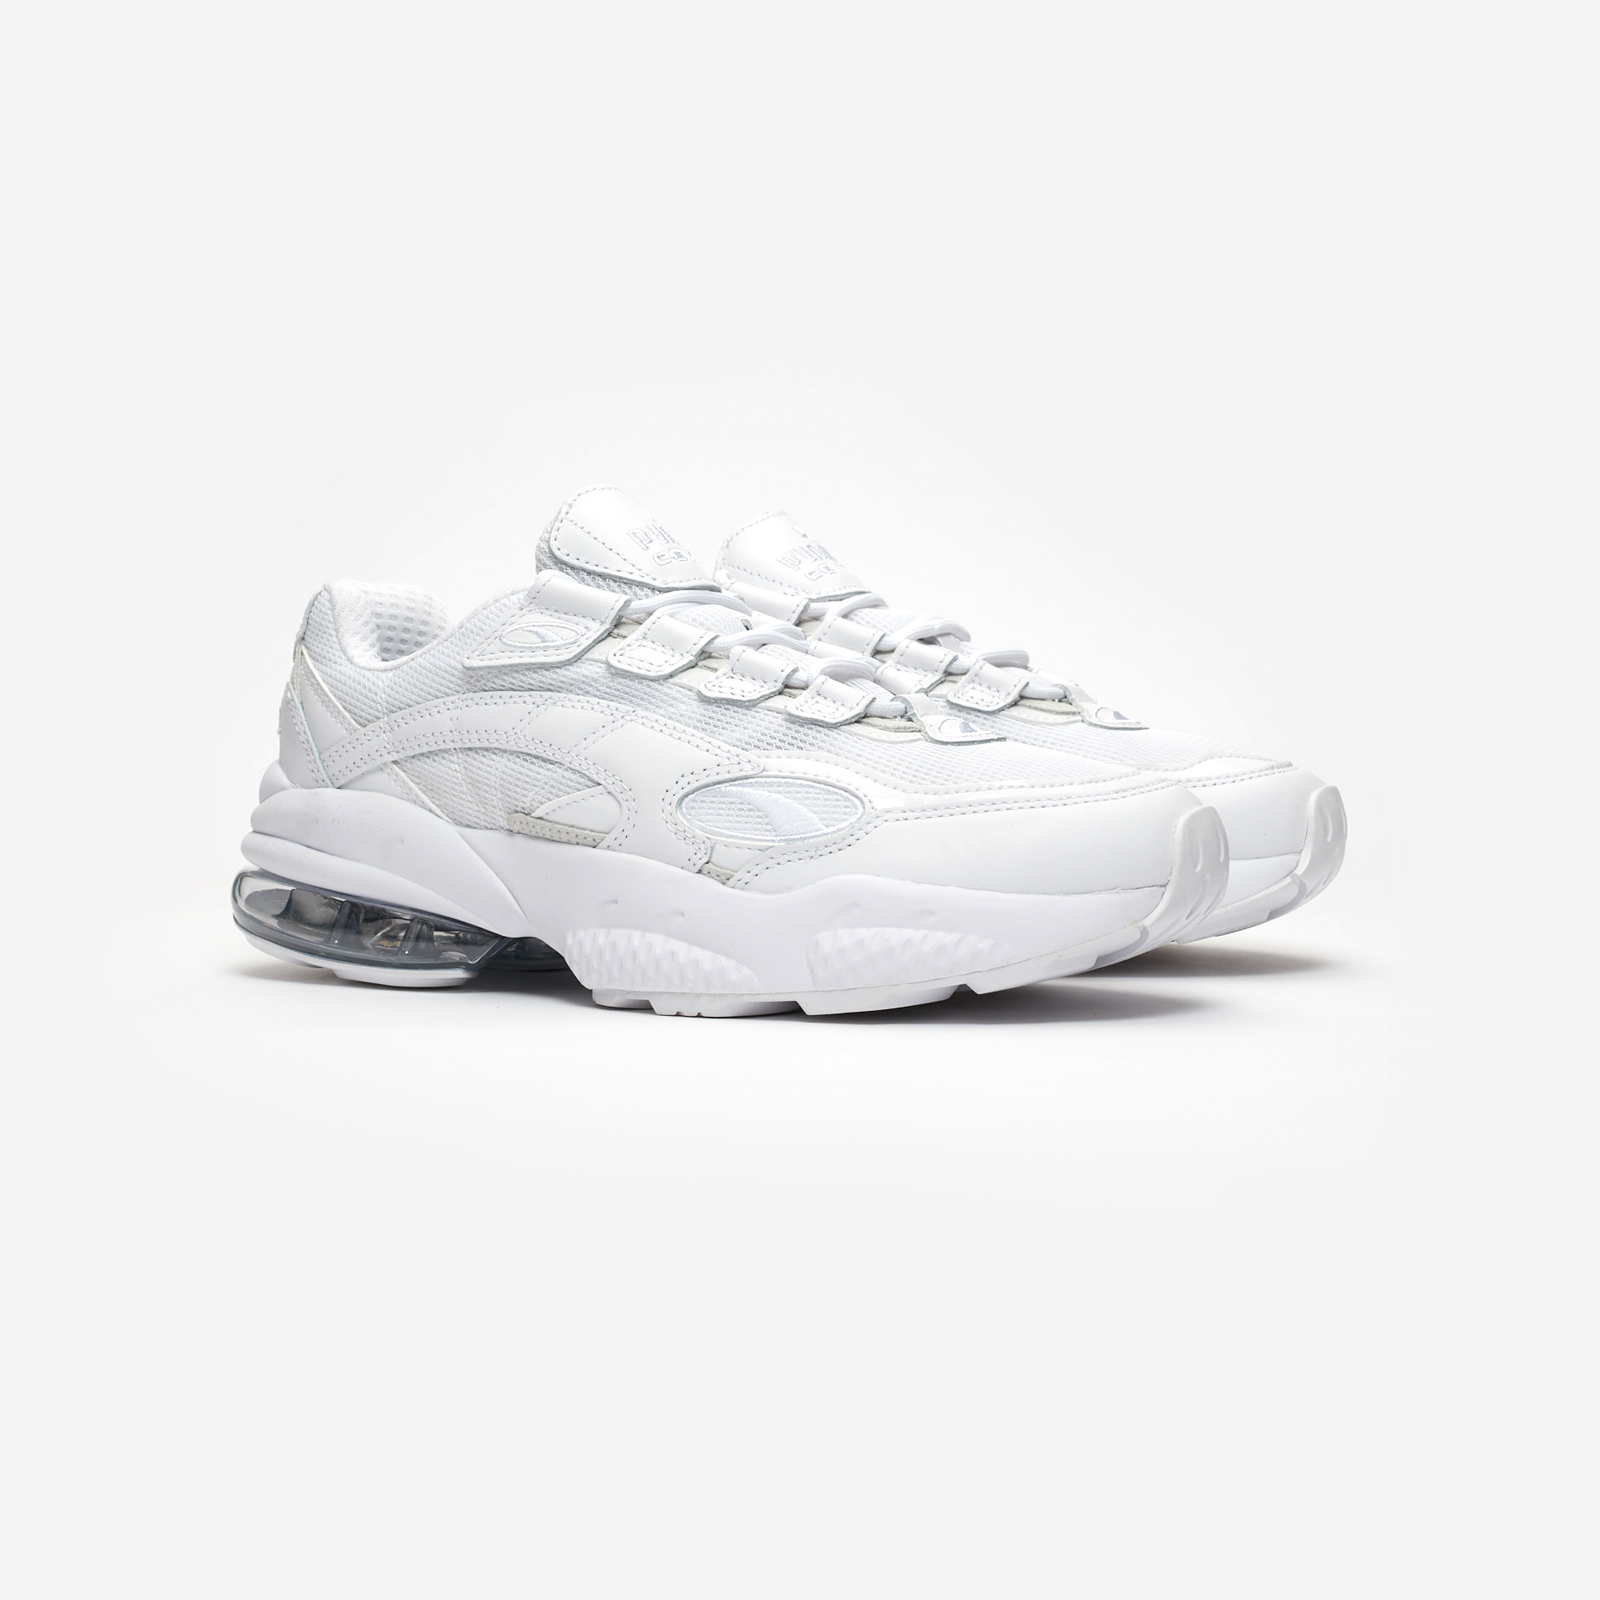 2ea9e257d6a6 Puma Cell Venom Reflective - 369701-02 - Sneakersnstuff